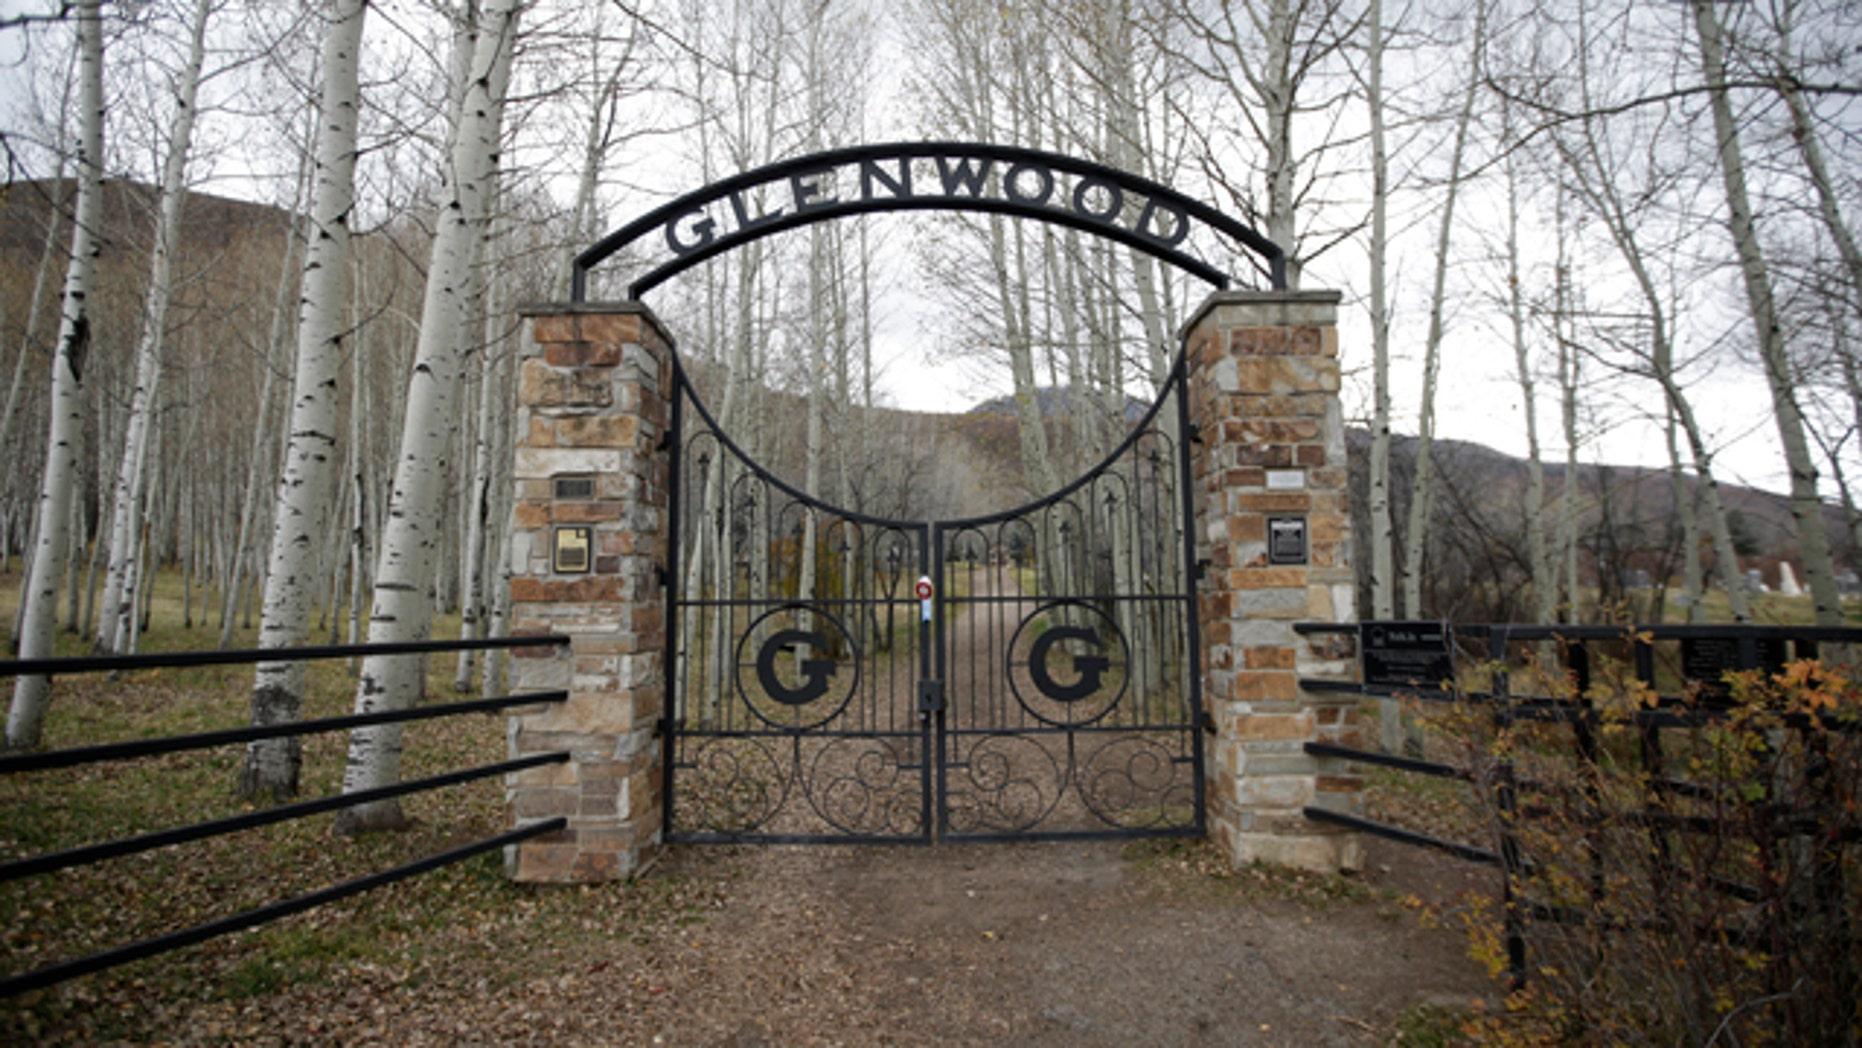 Oct. 29, 2015: The Glenwood Cemetery gate is shown in Park City, Utah. (AP Photo/Rick Bowmer)